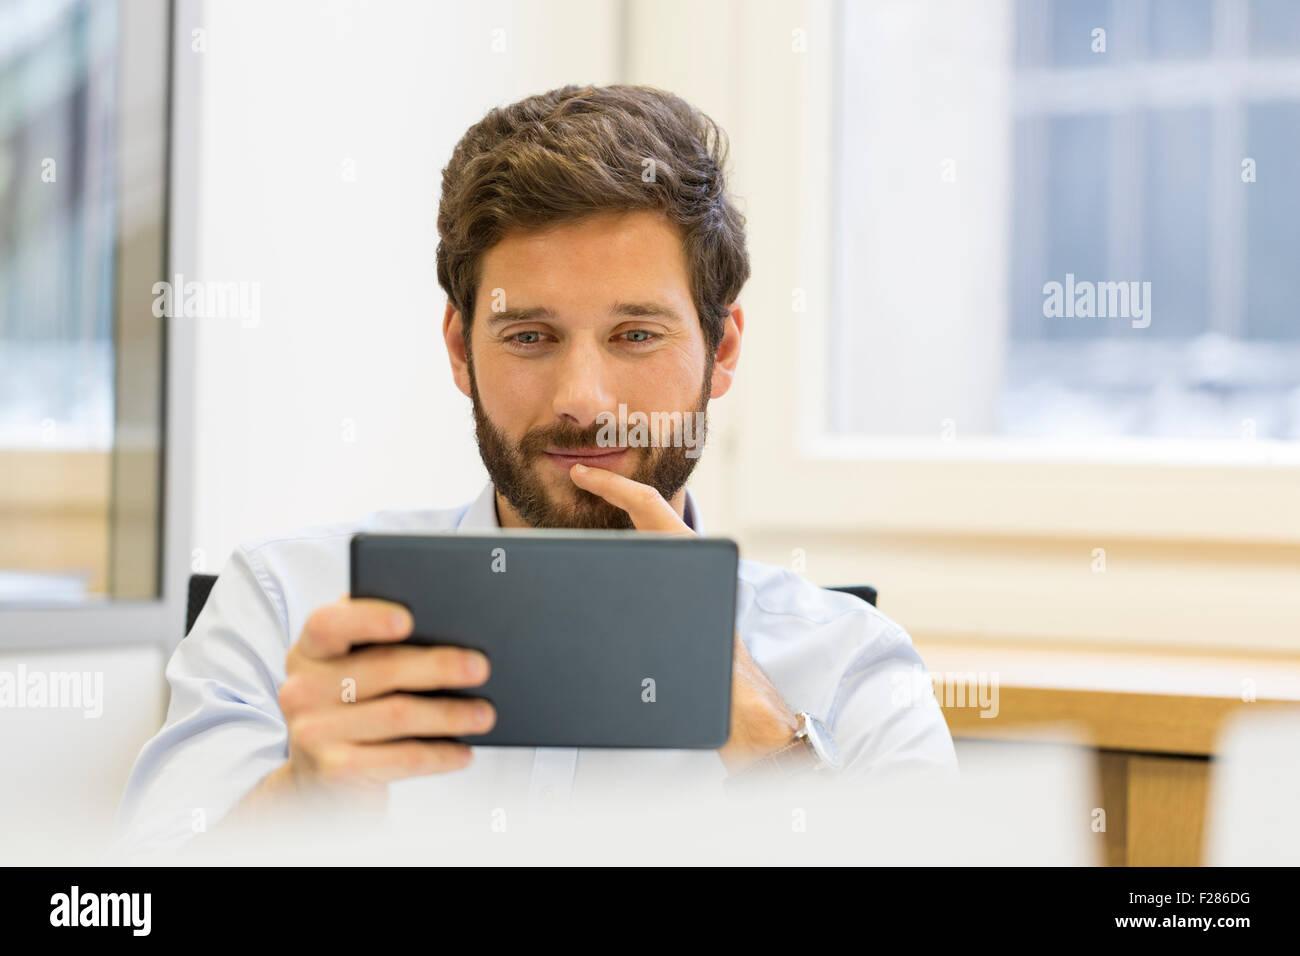 Pensive businessman using digital tablet in office Banque D'Images